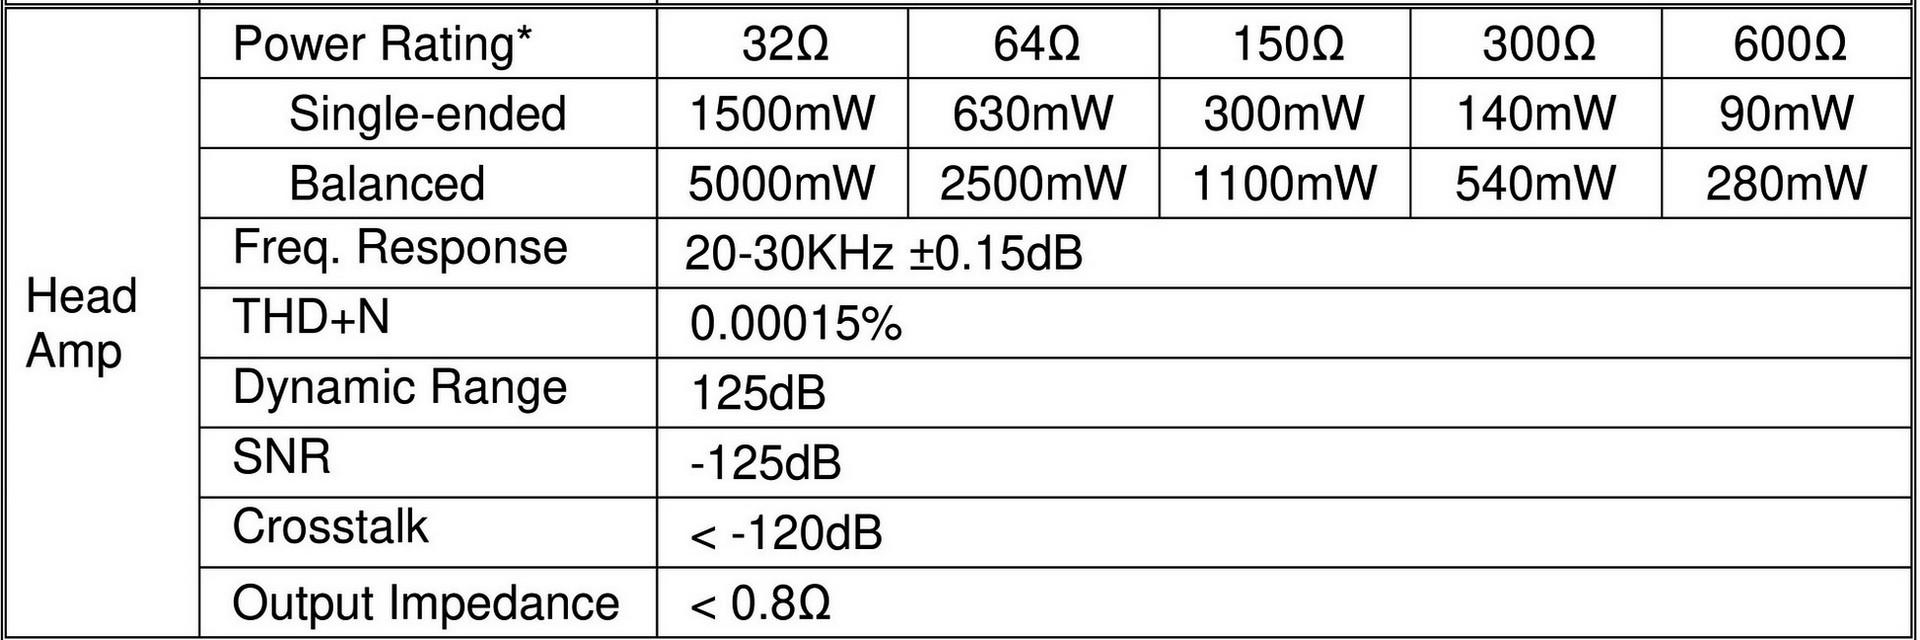 DA1 Head Amp Specification.jpg